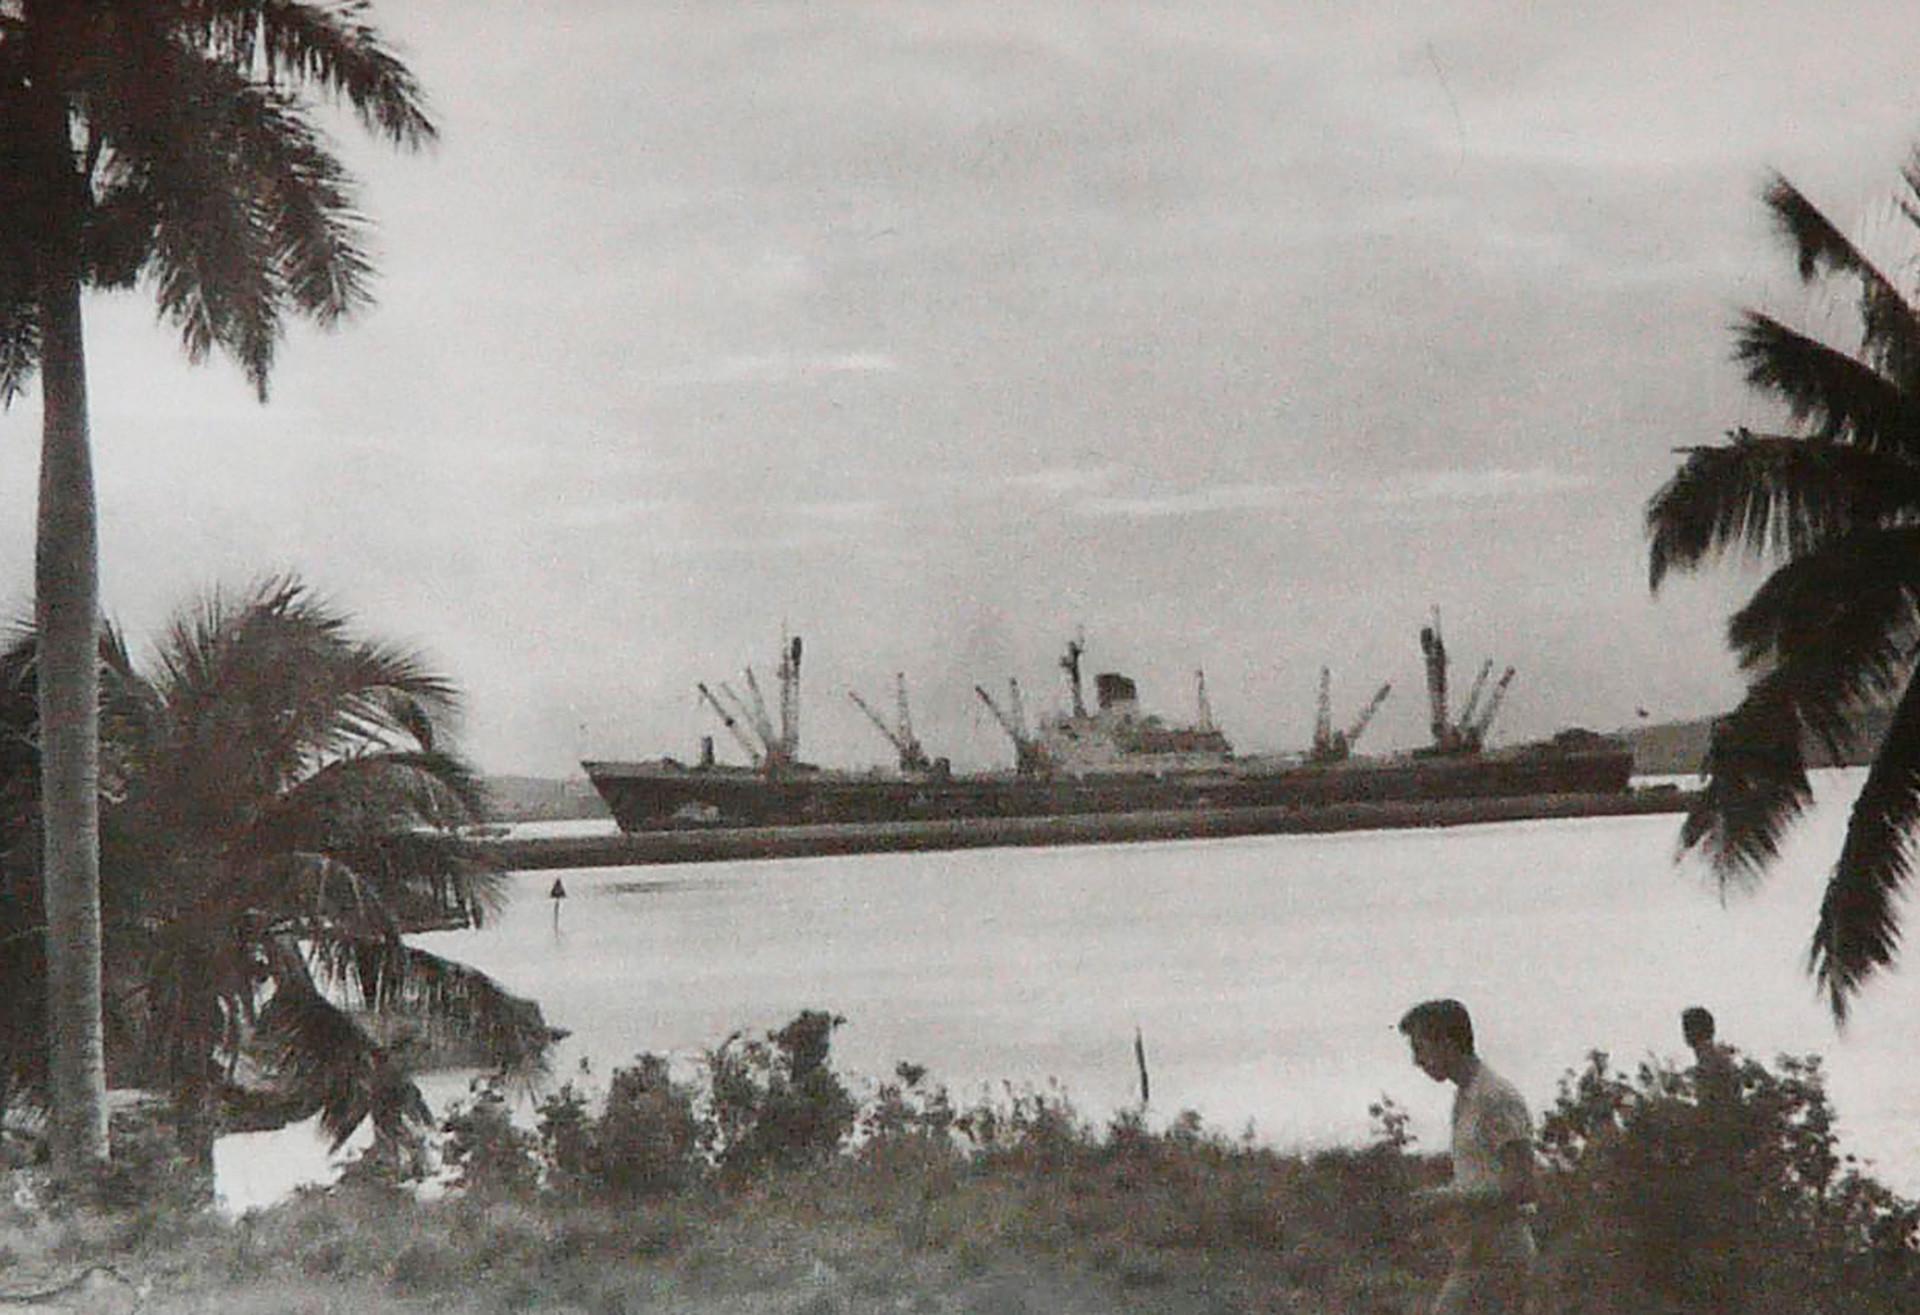 Cargueiro soviético Iliá Mietrikhov em Cuba